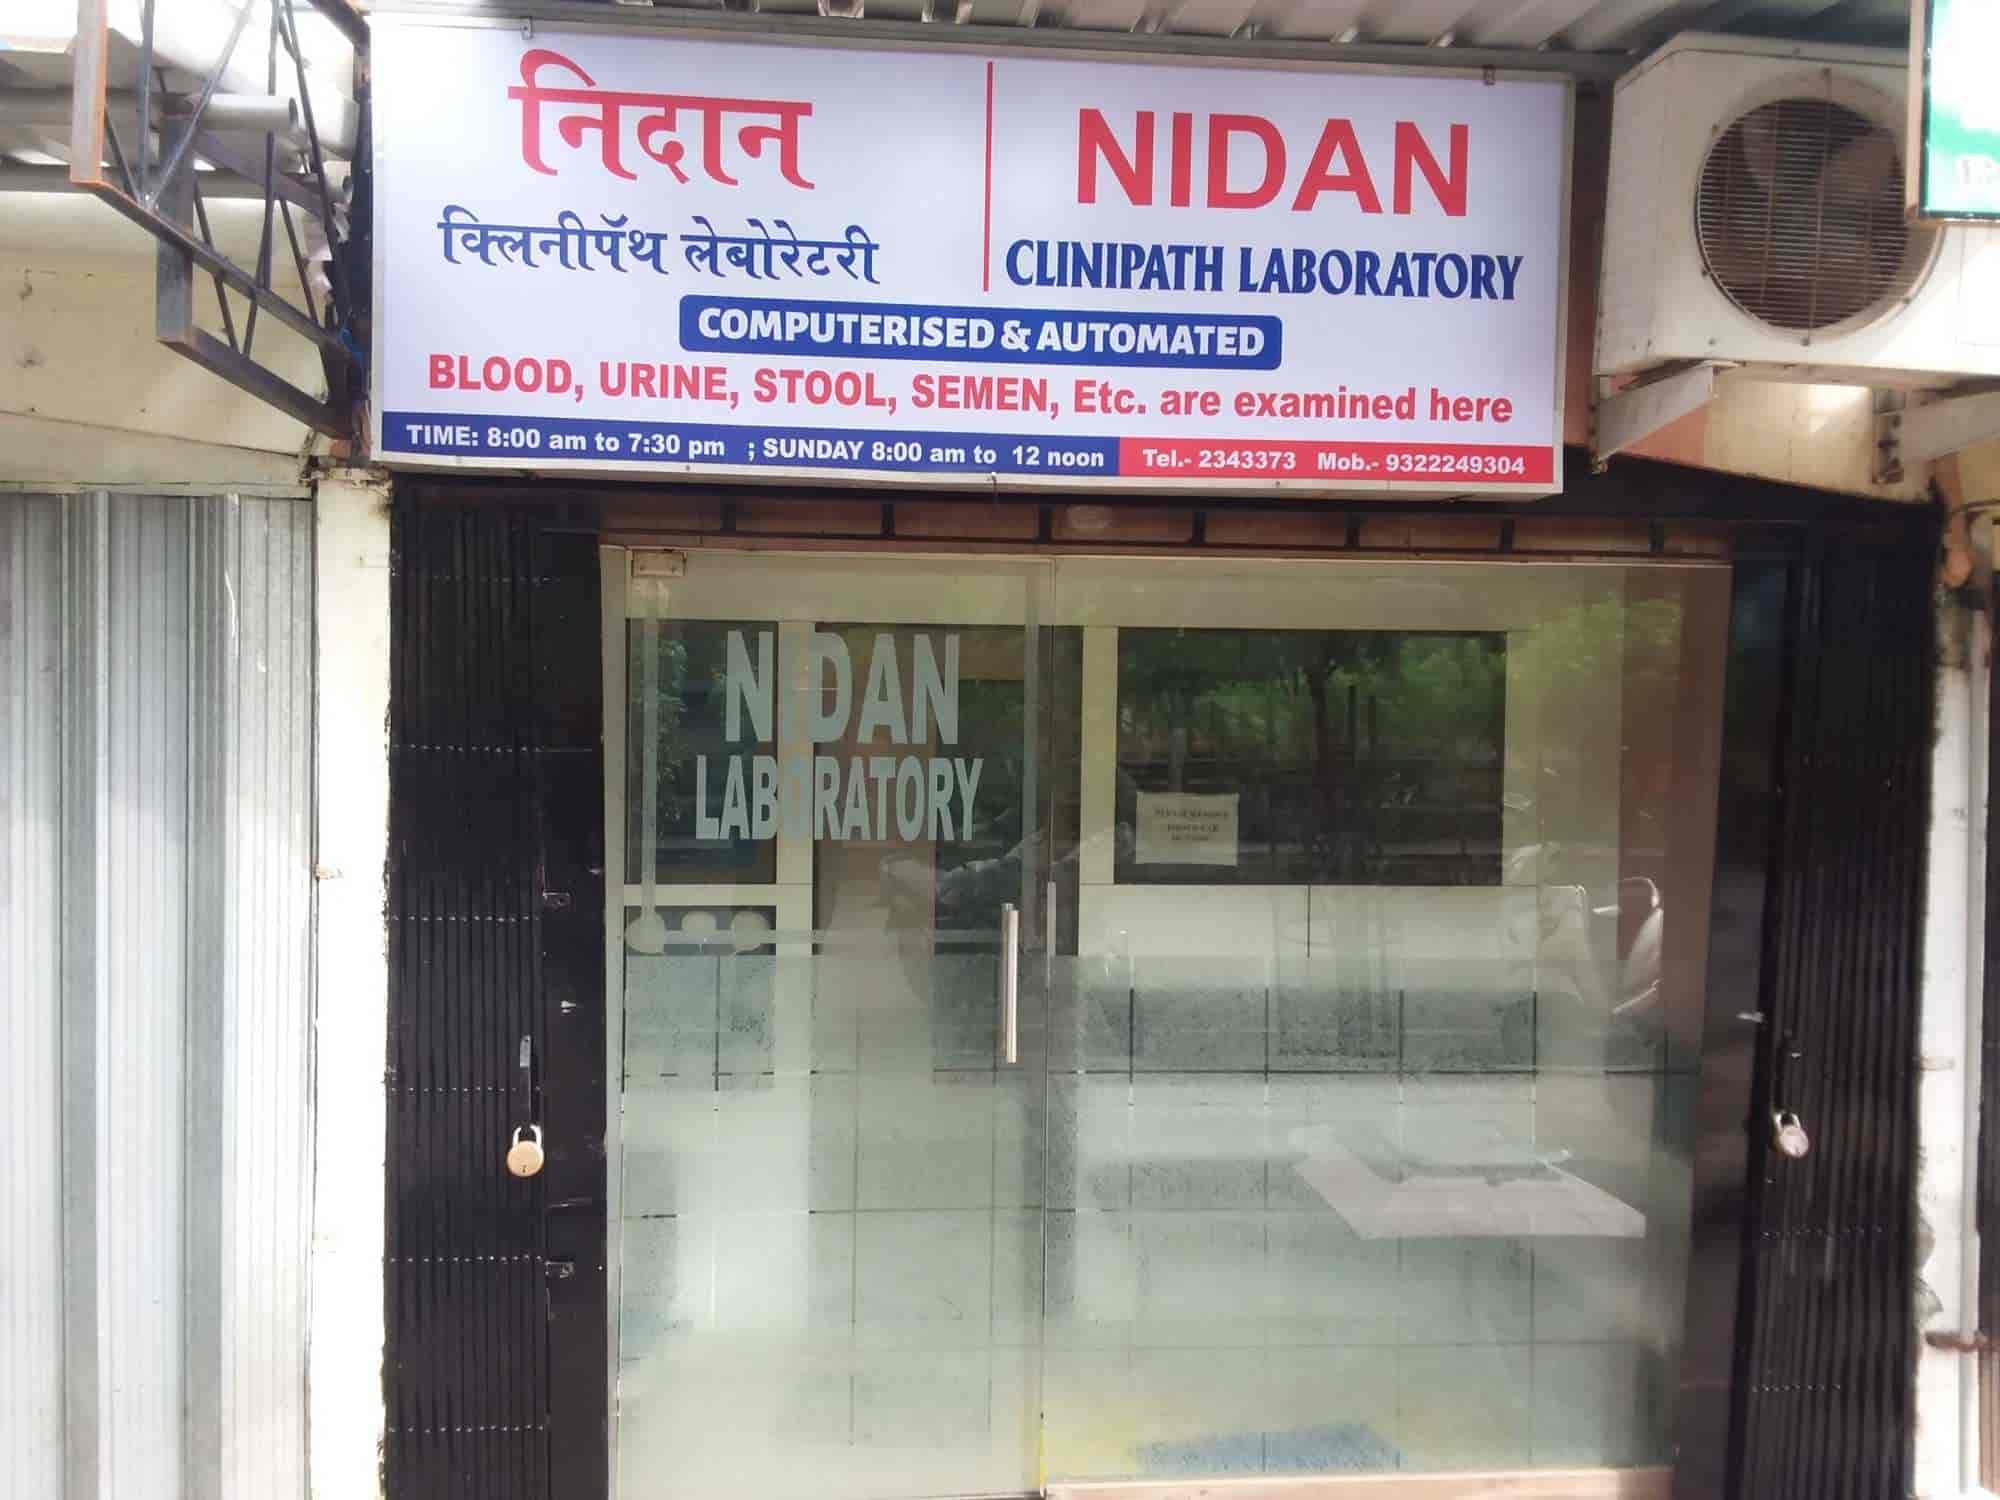 Nidan Clinipath Laboratory, Vasai Road West - Pathology Labs